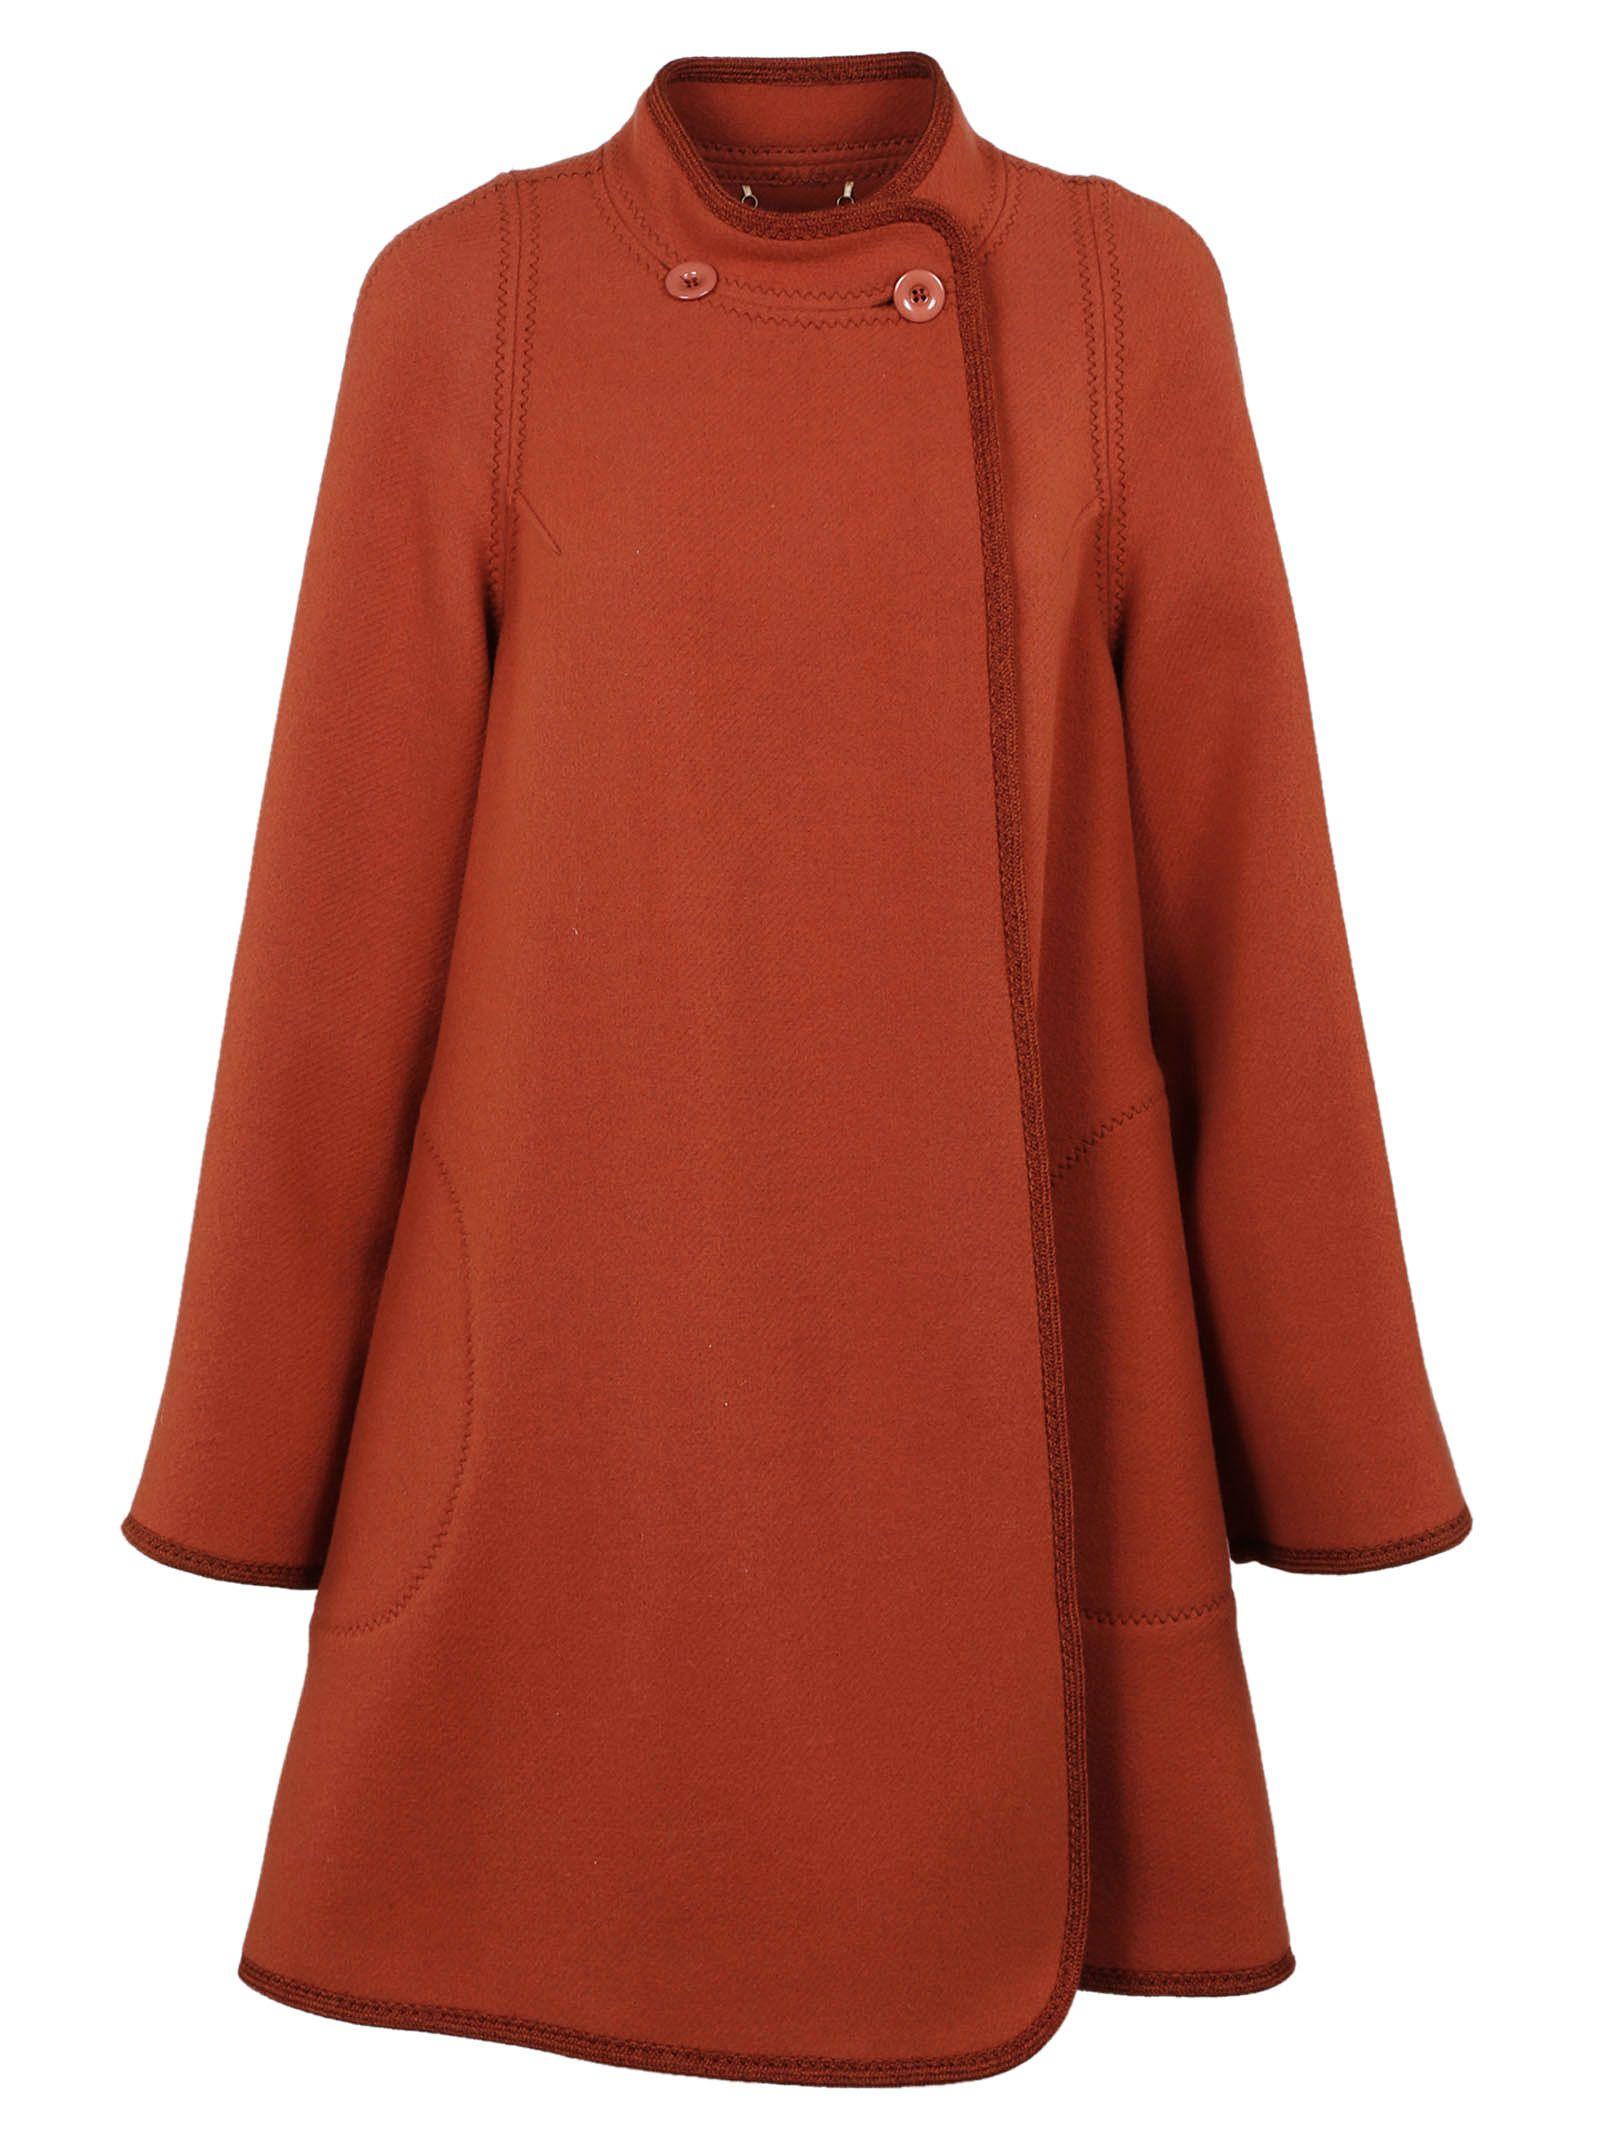 Chlo? Oversized Cocoon Coat